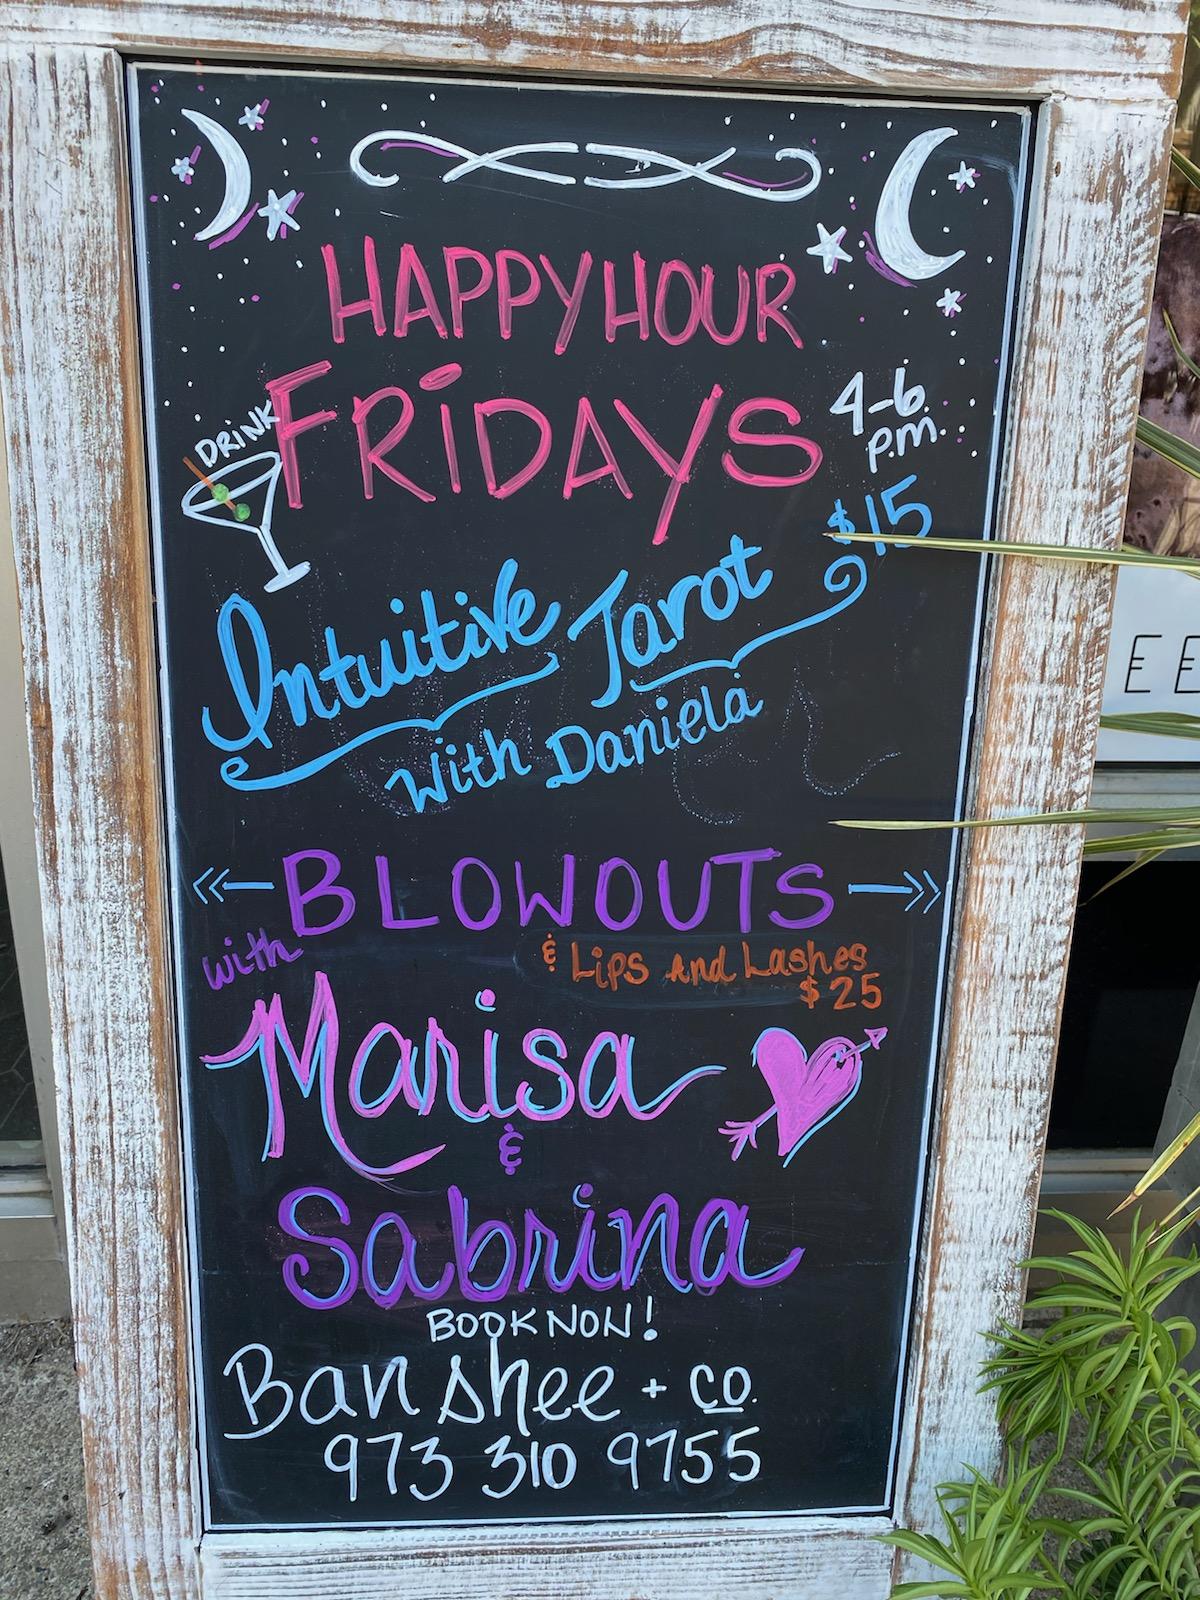 Banshee Happy Hour Fridays! - Blowouts + Intuitive Tarot Readings🎉🎇